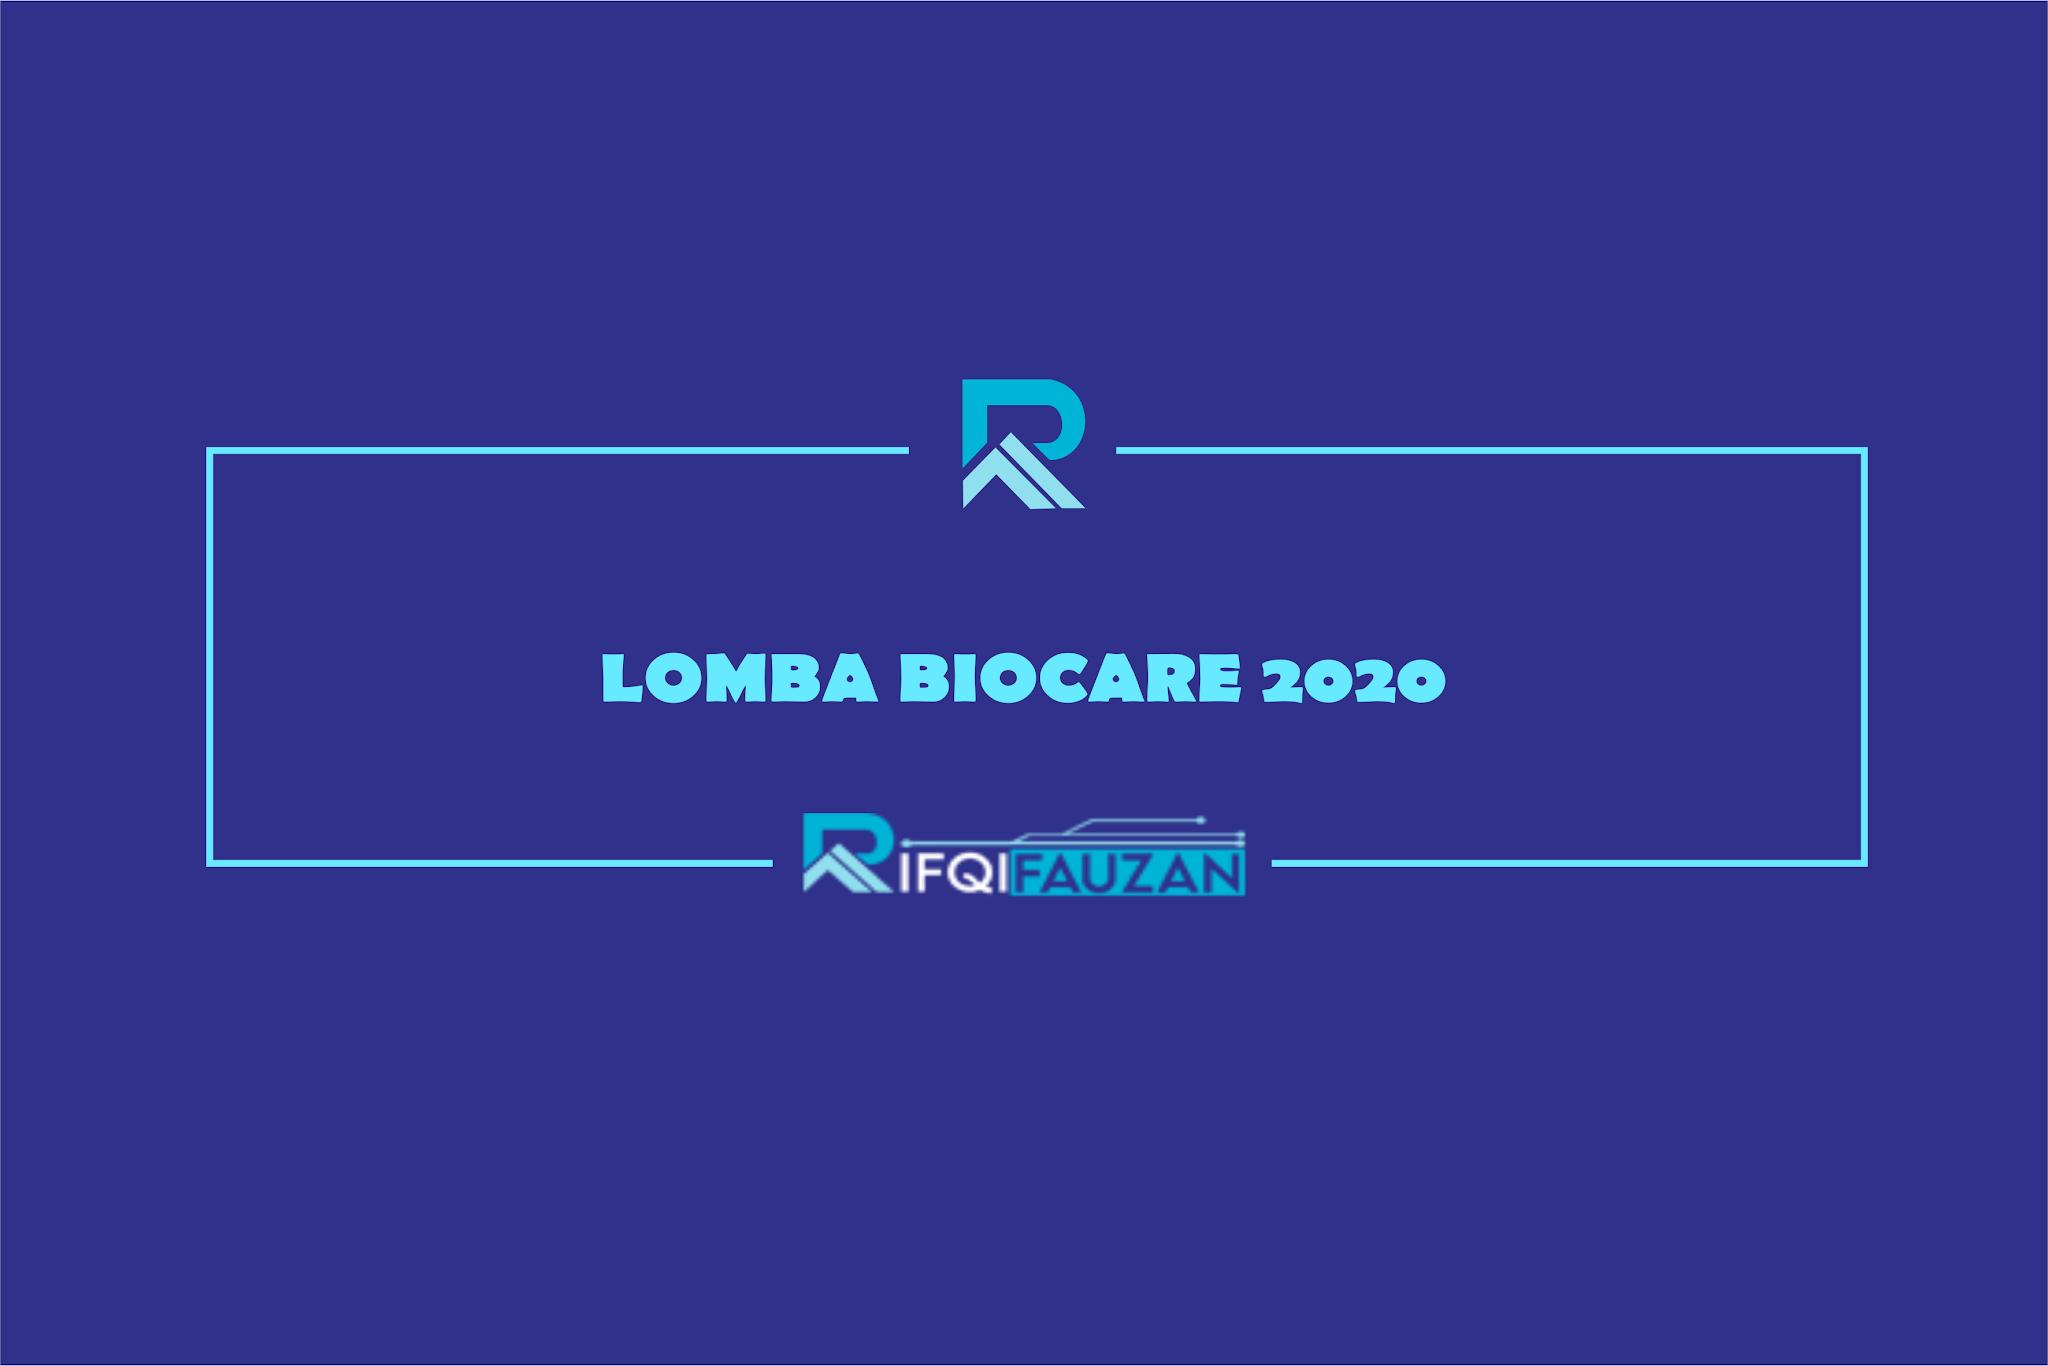 BIOCARE 2020 Lomba Photography, Essay, Karya Tulis Ilmiah, Video Kreatif 2020